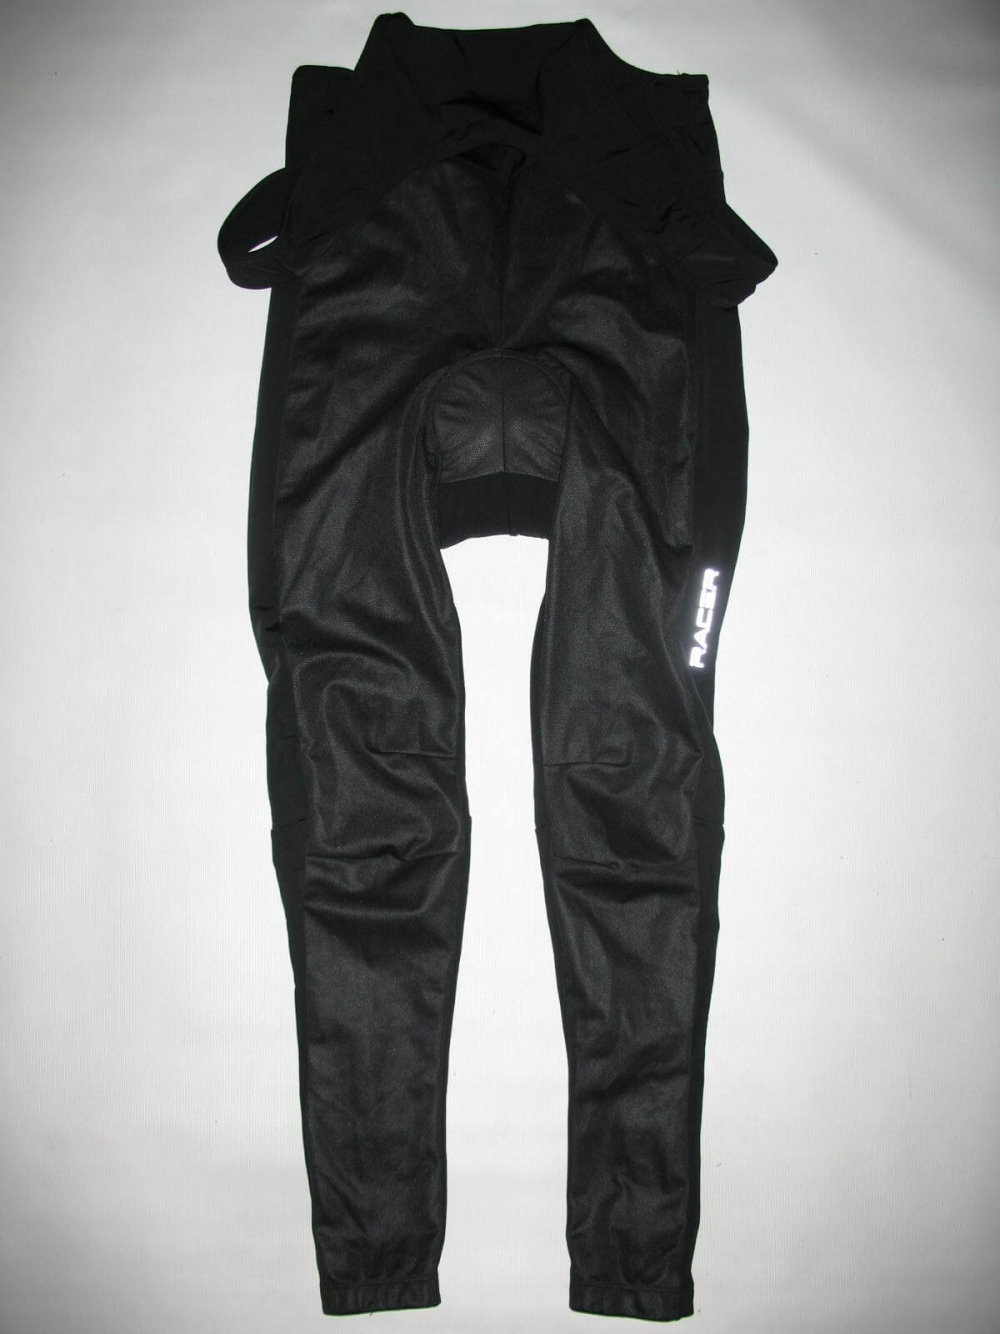 Брюки RACER bib pants (размер S/M) - 1